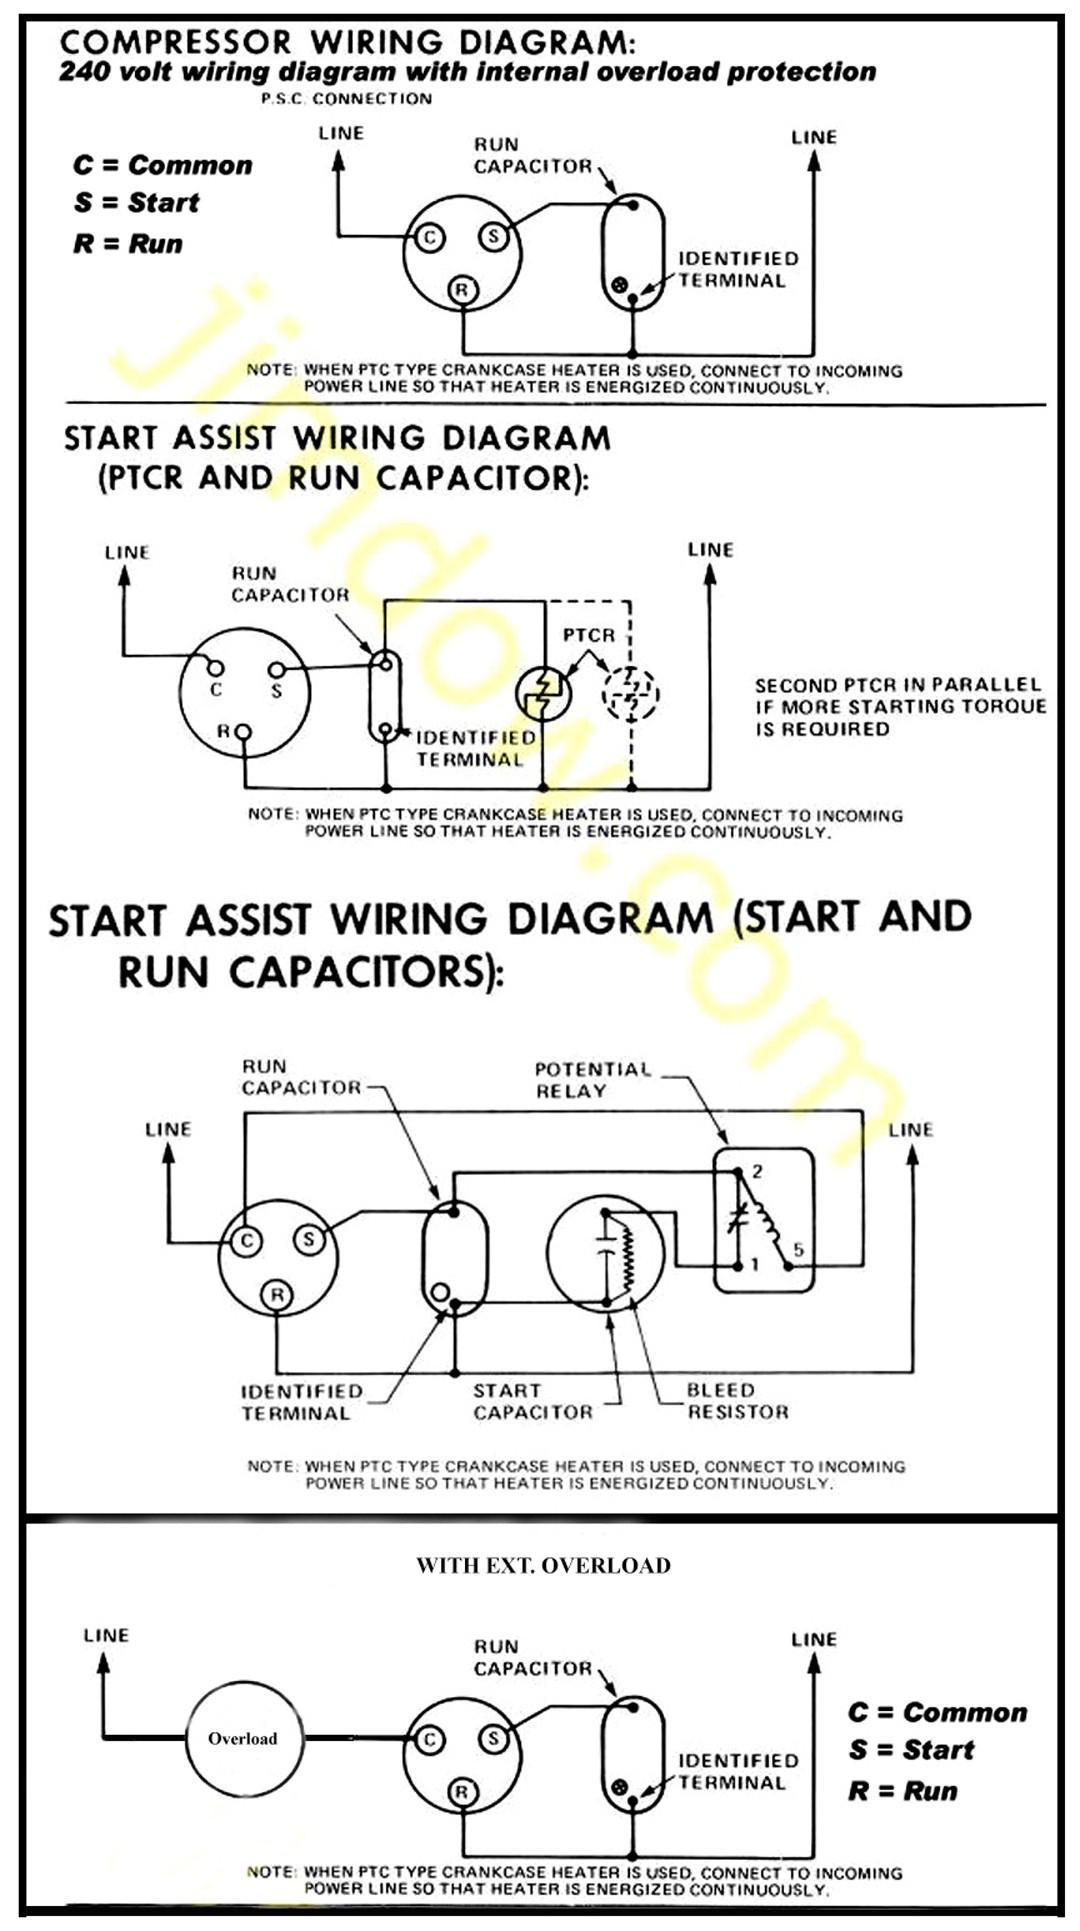 Unique Danfoss 12V Compressor Wiring Diagram New Embraco All - Embraco Compressor Wiring Diagram